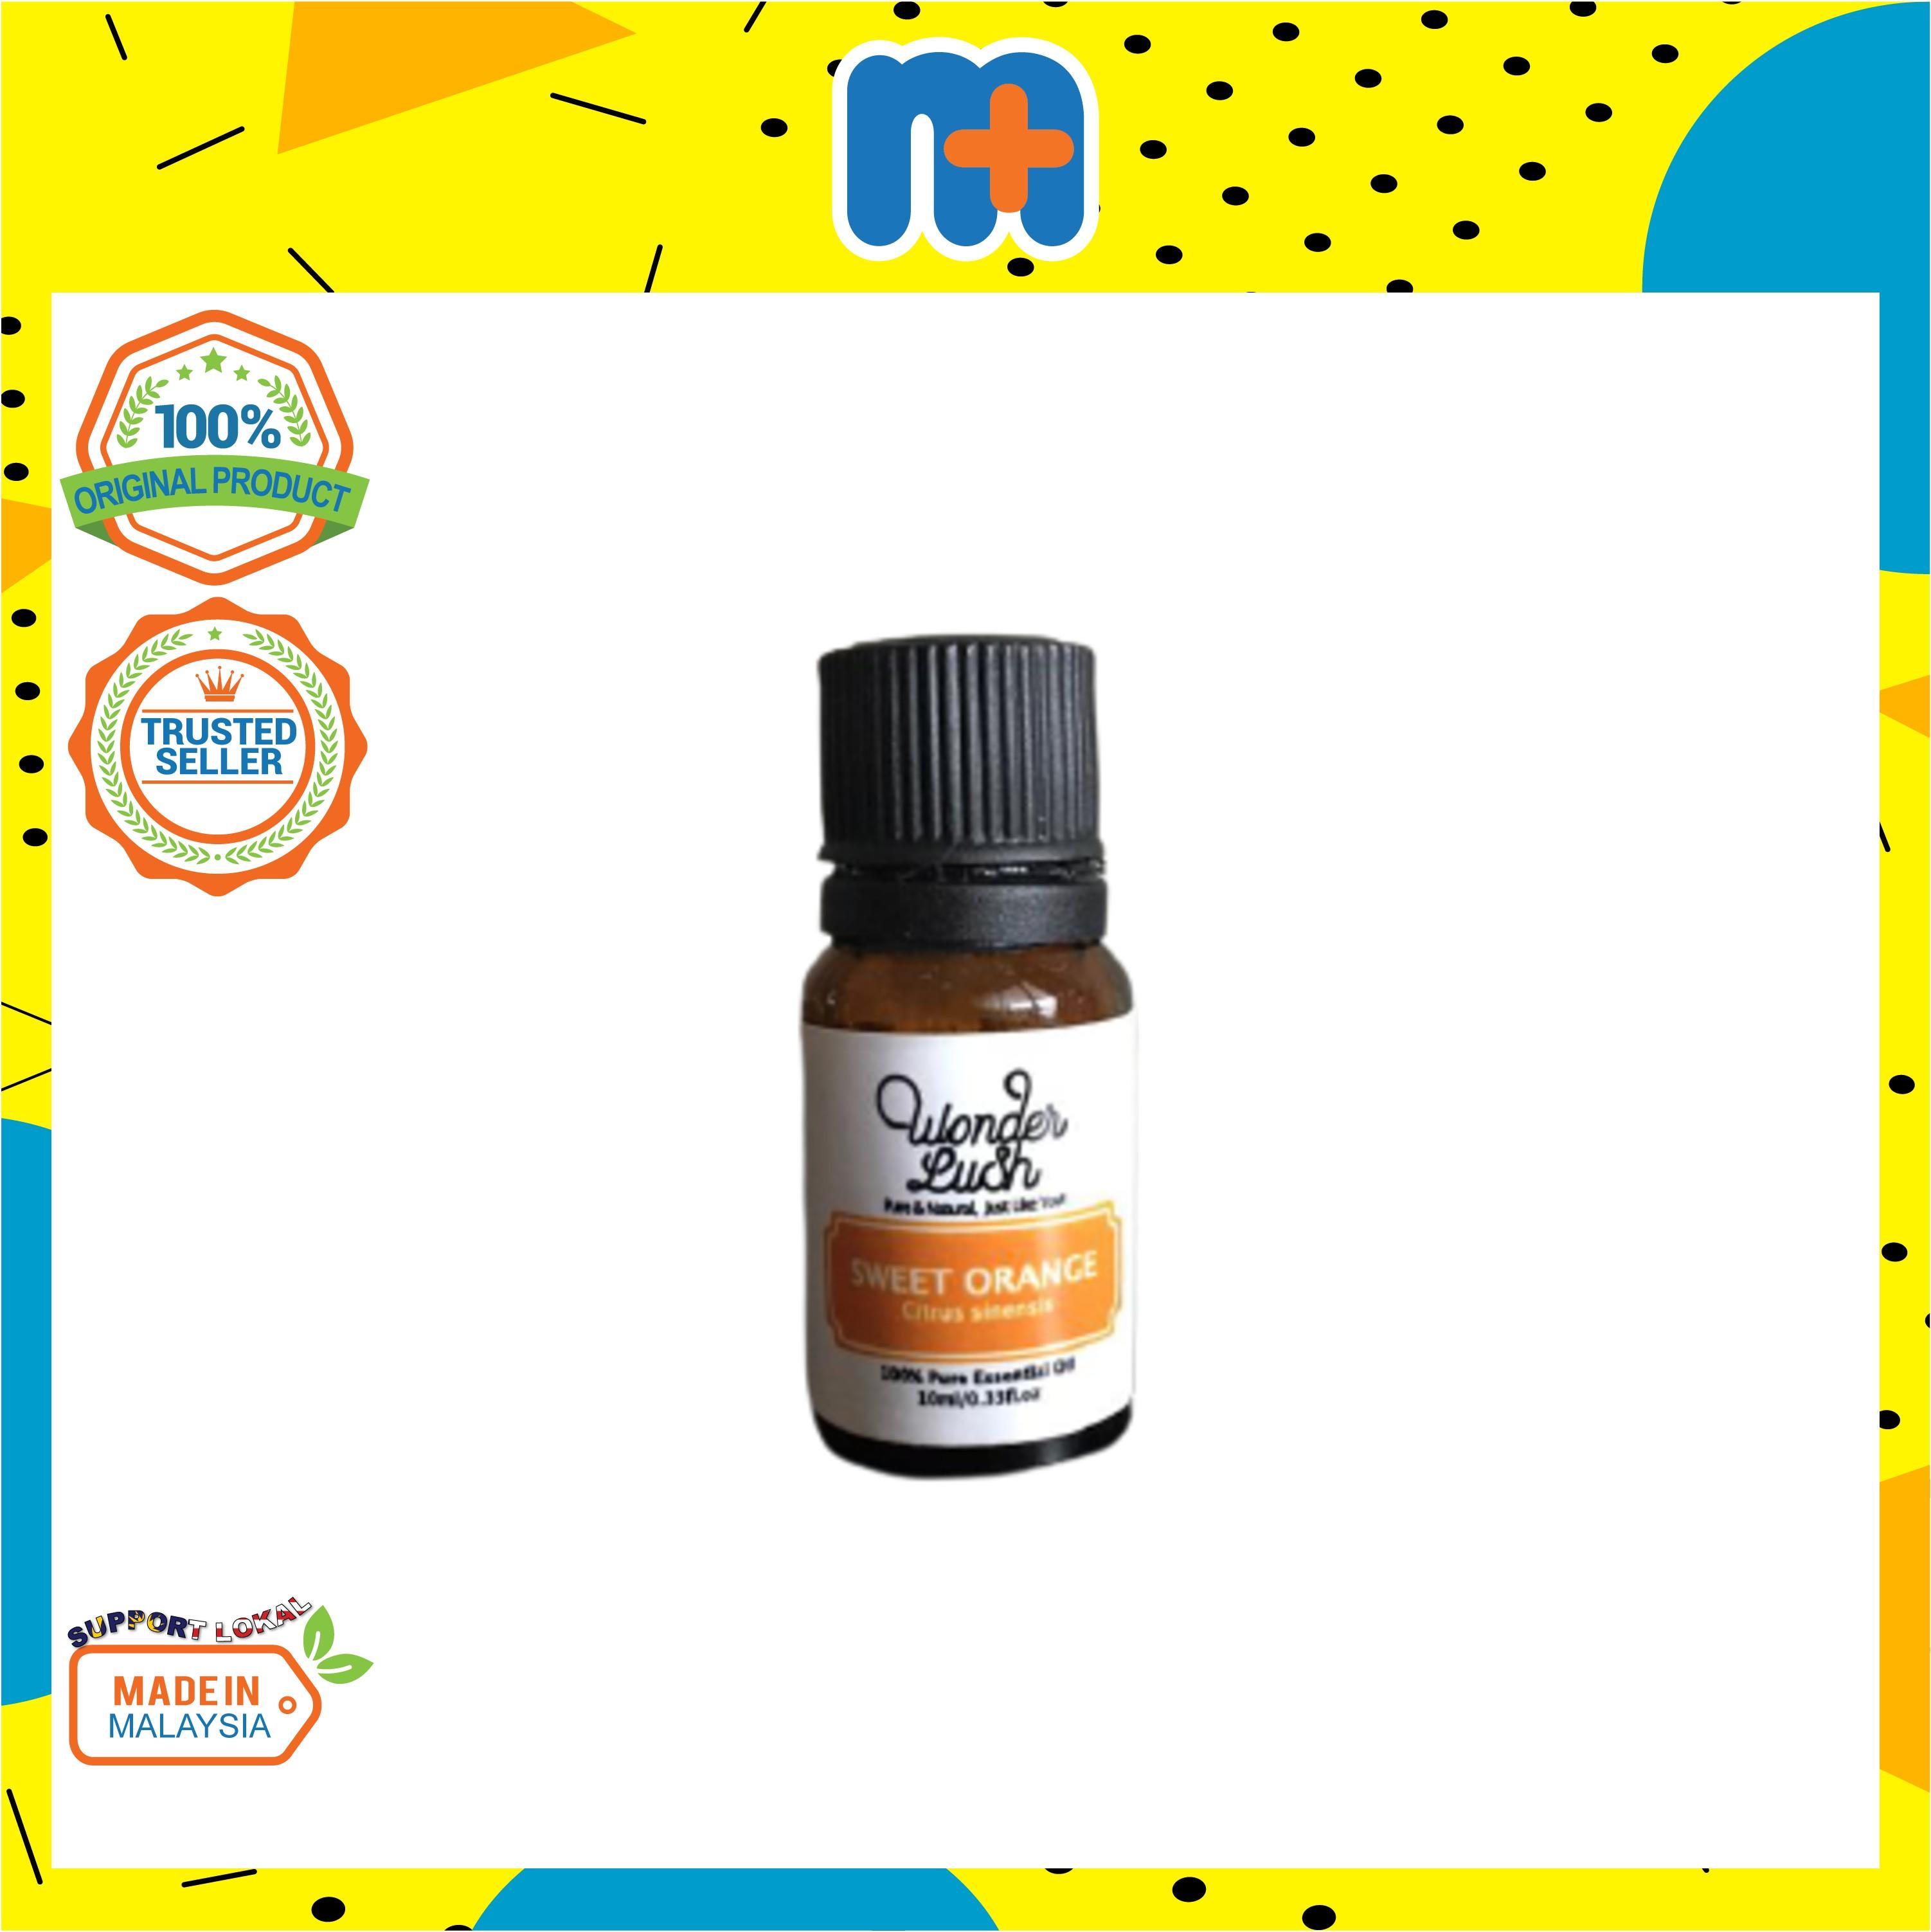 [MPLUS] WONDERLUSH Sweet Orange Essential Oil 10ml